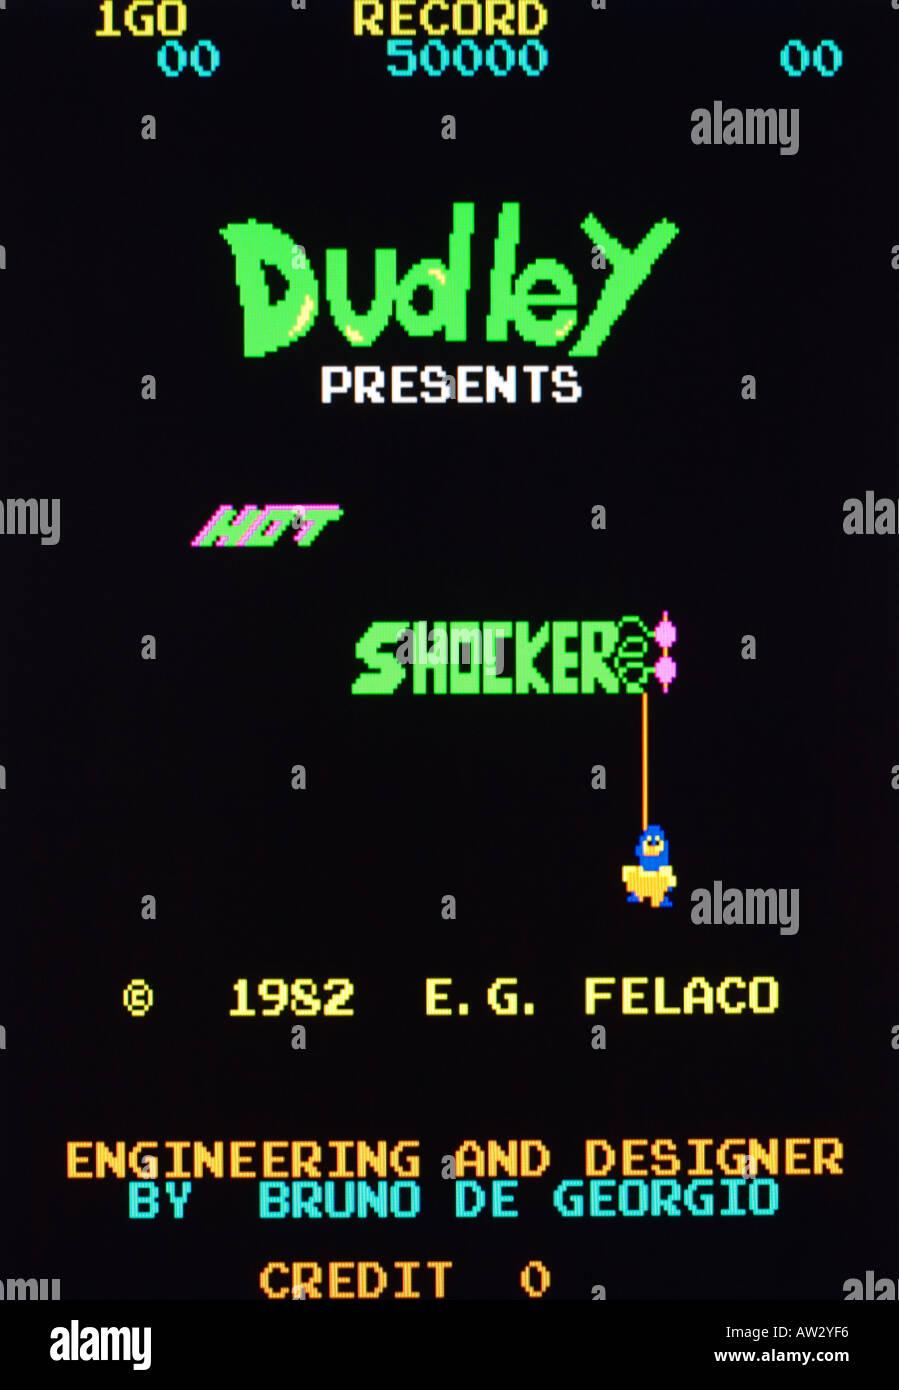 Hot Shocker E G Felaco 1982 Vintage arcade videogame screen shot - EDITORIAL USE ONLY - Stock Image